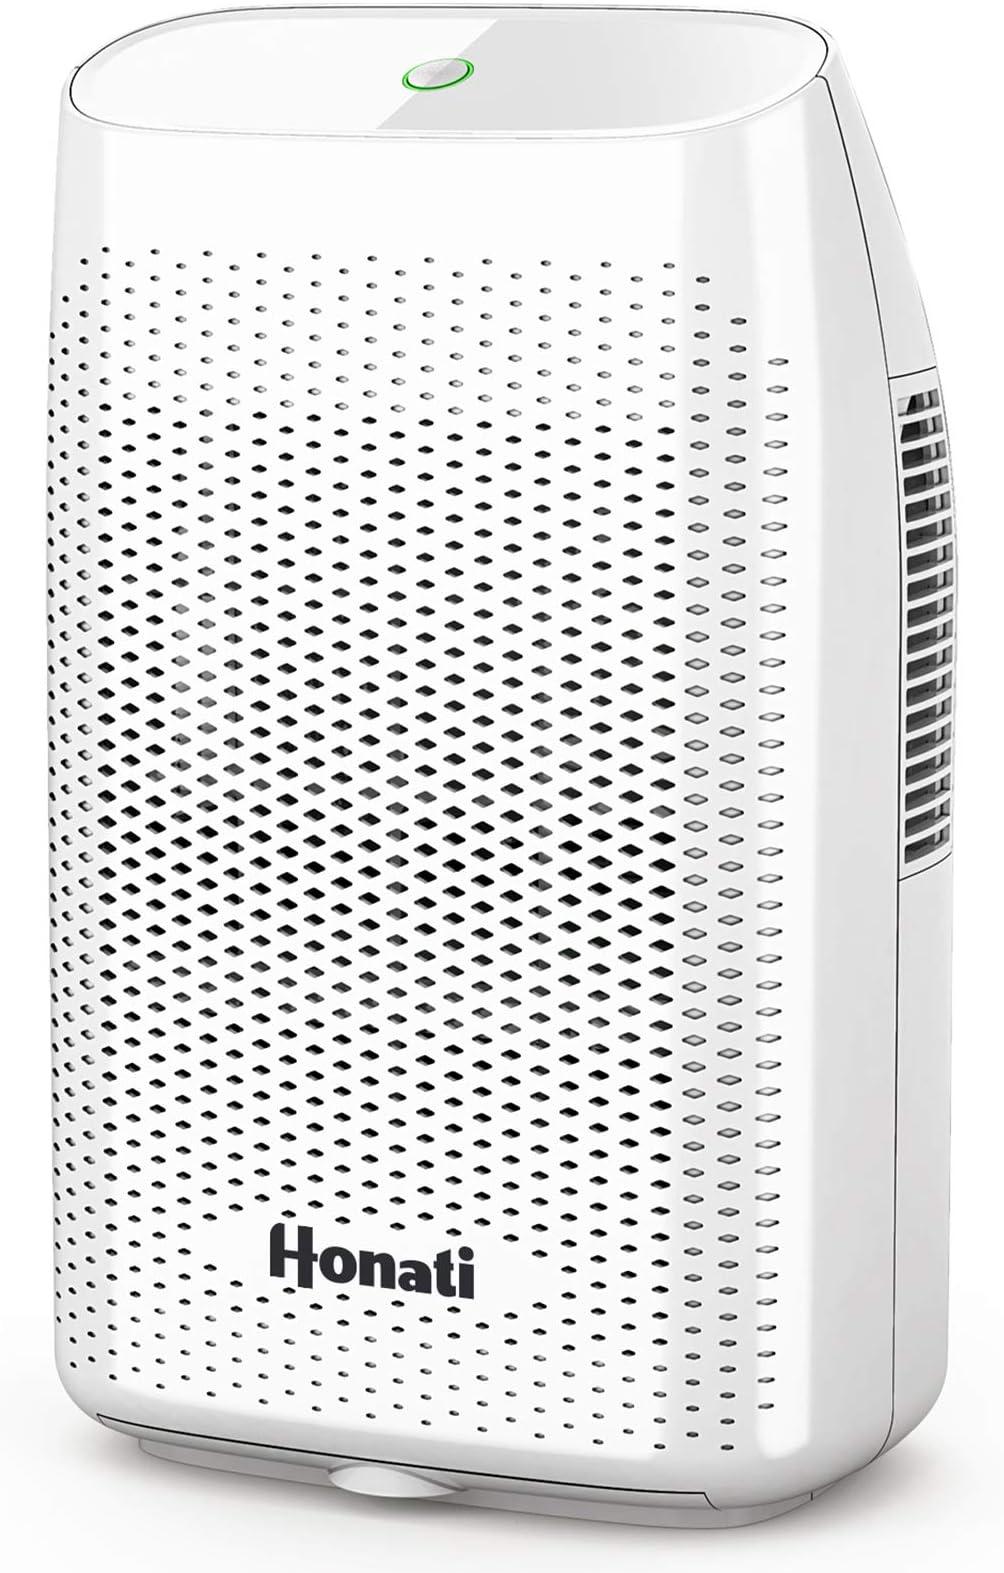 Home Dehumidifier, 2500 Cubic Feet (269 sq ft) 2000ml Ultra Quiet Small Portable Dehumidifiers with Auto Shut Off for Basement, Bathroom, RV, Office